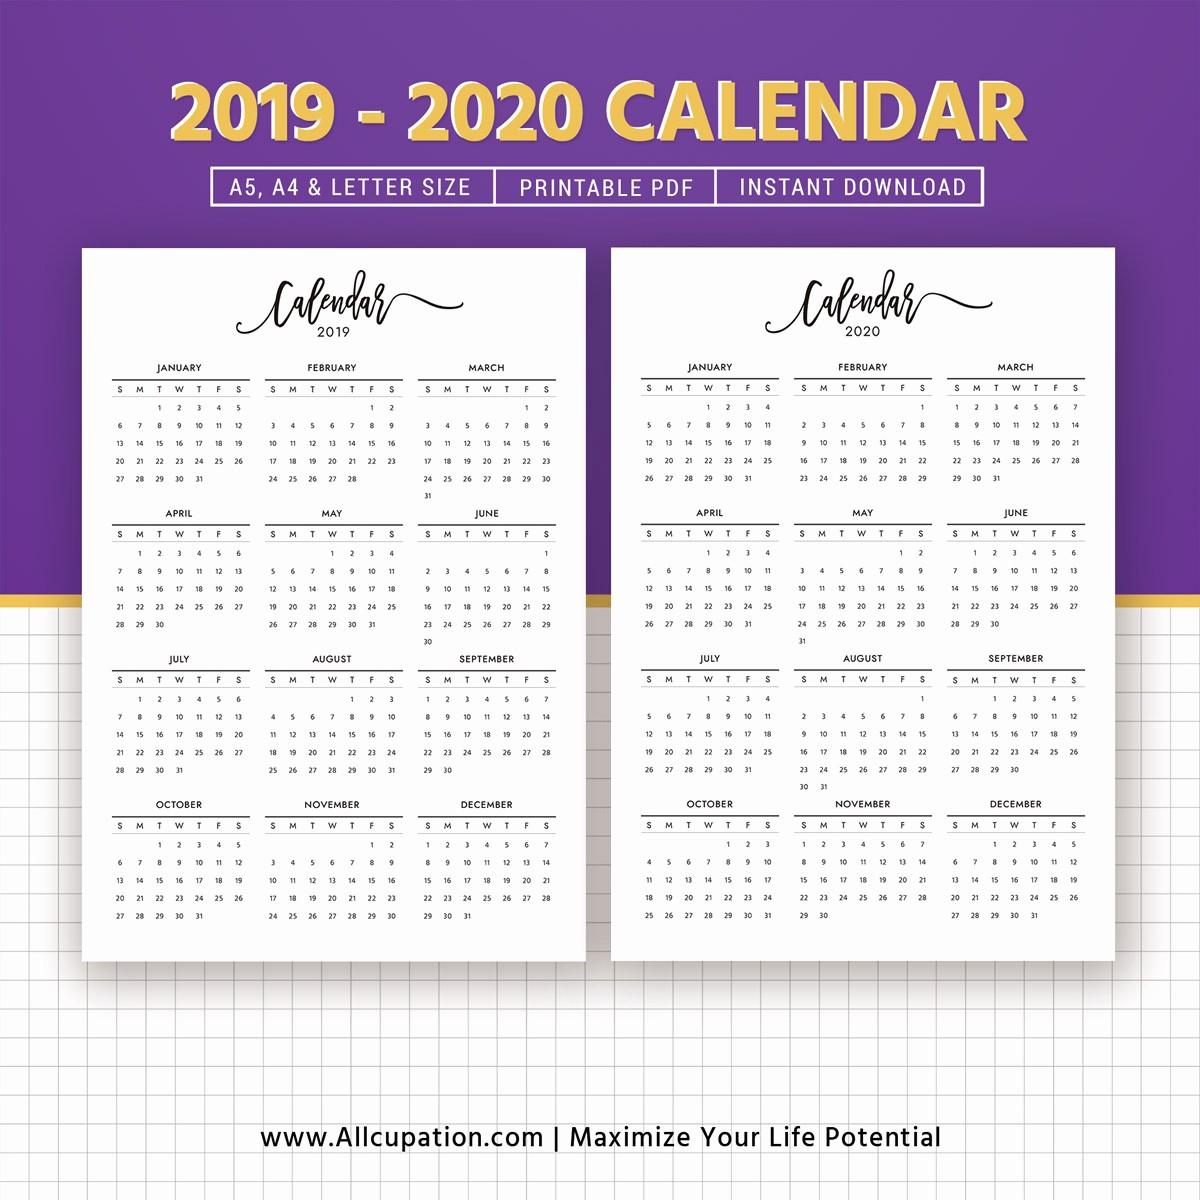 2019 and 2020 Calendar Printable New 2019 2020 Calendar Printable Calendar Planner Design